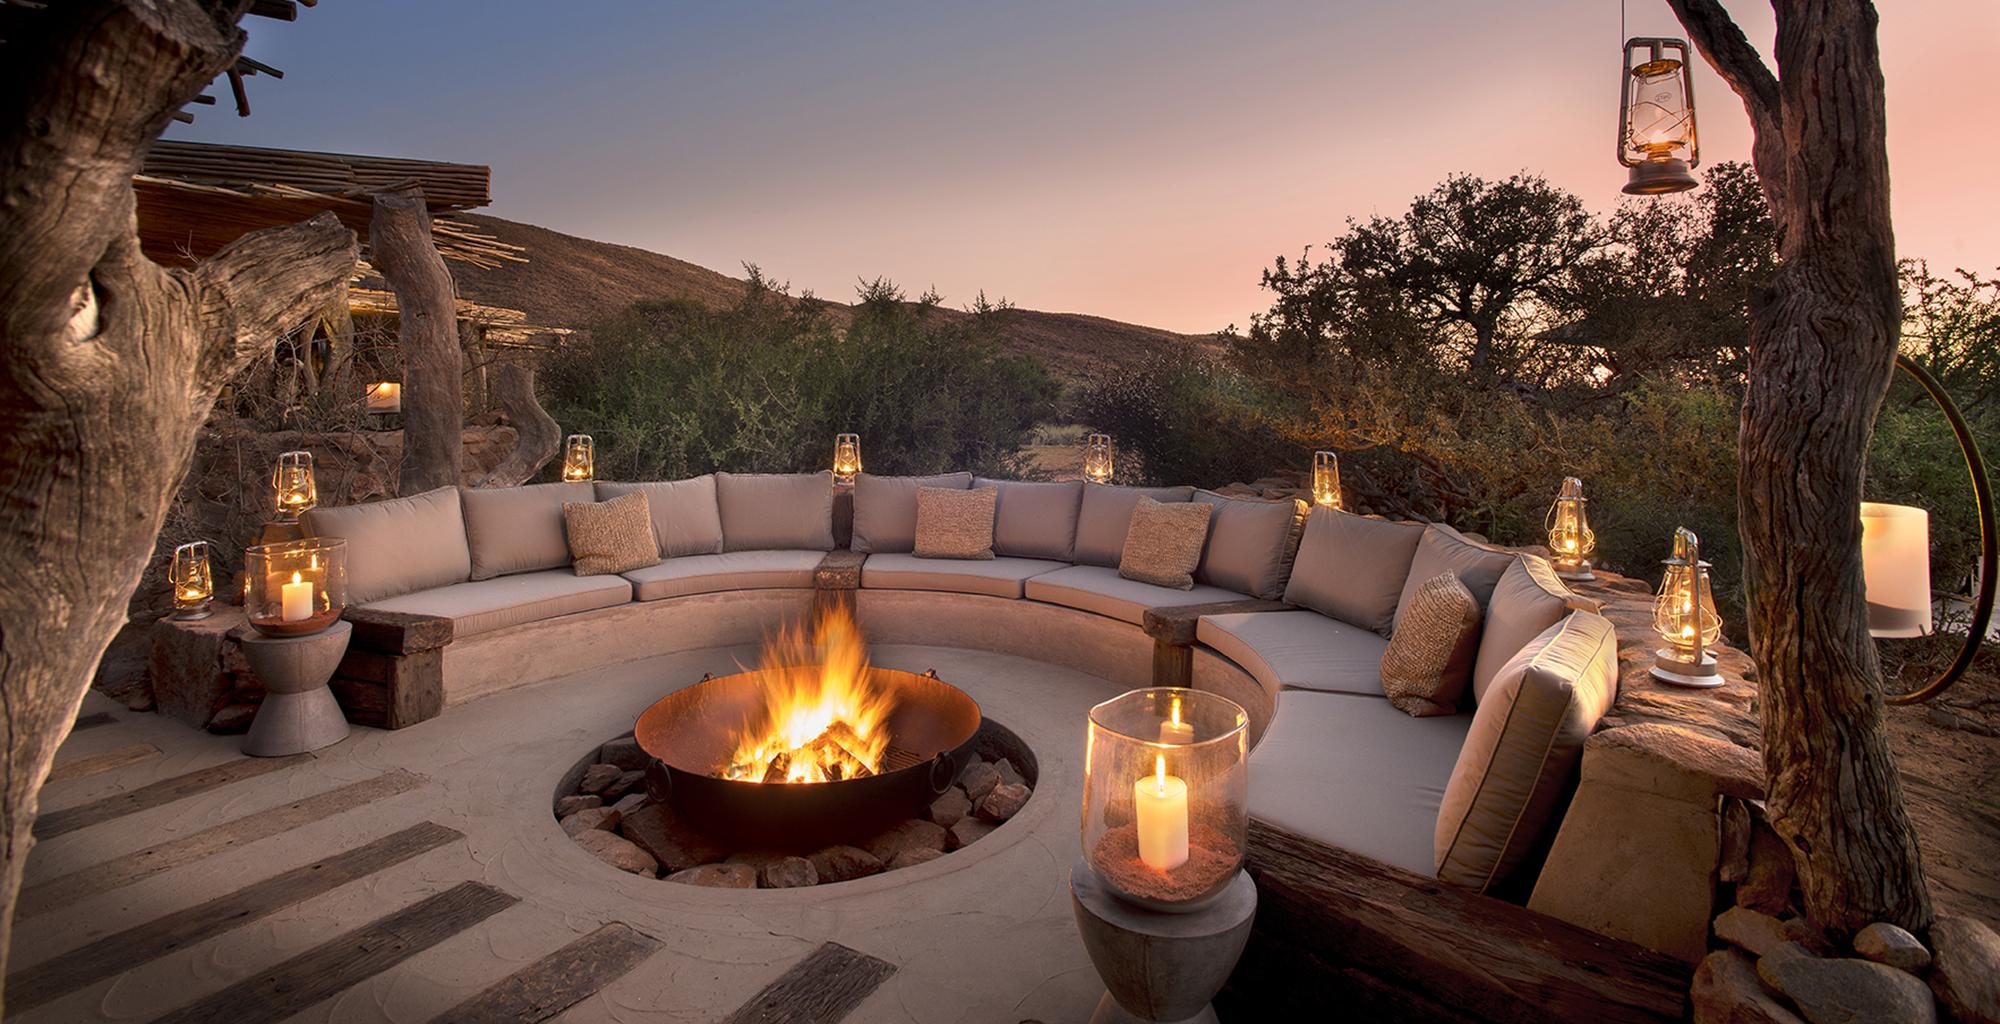 South-Africa-Motse-Lodge-Fire